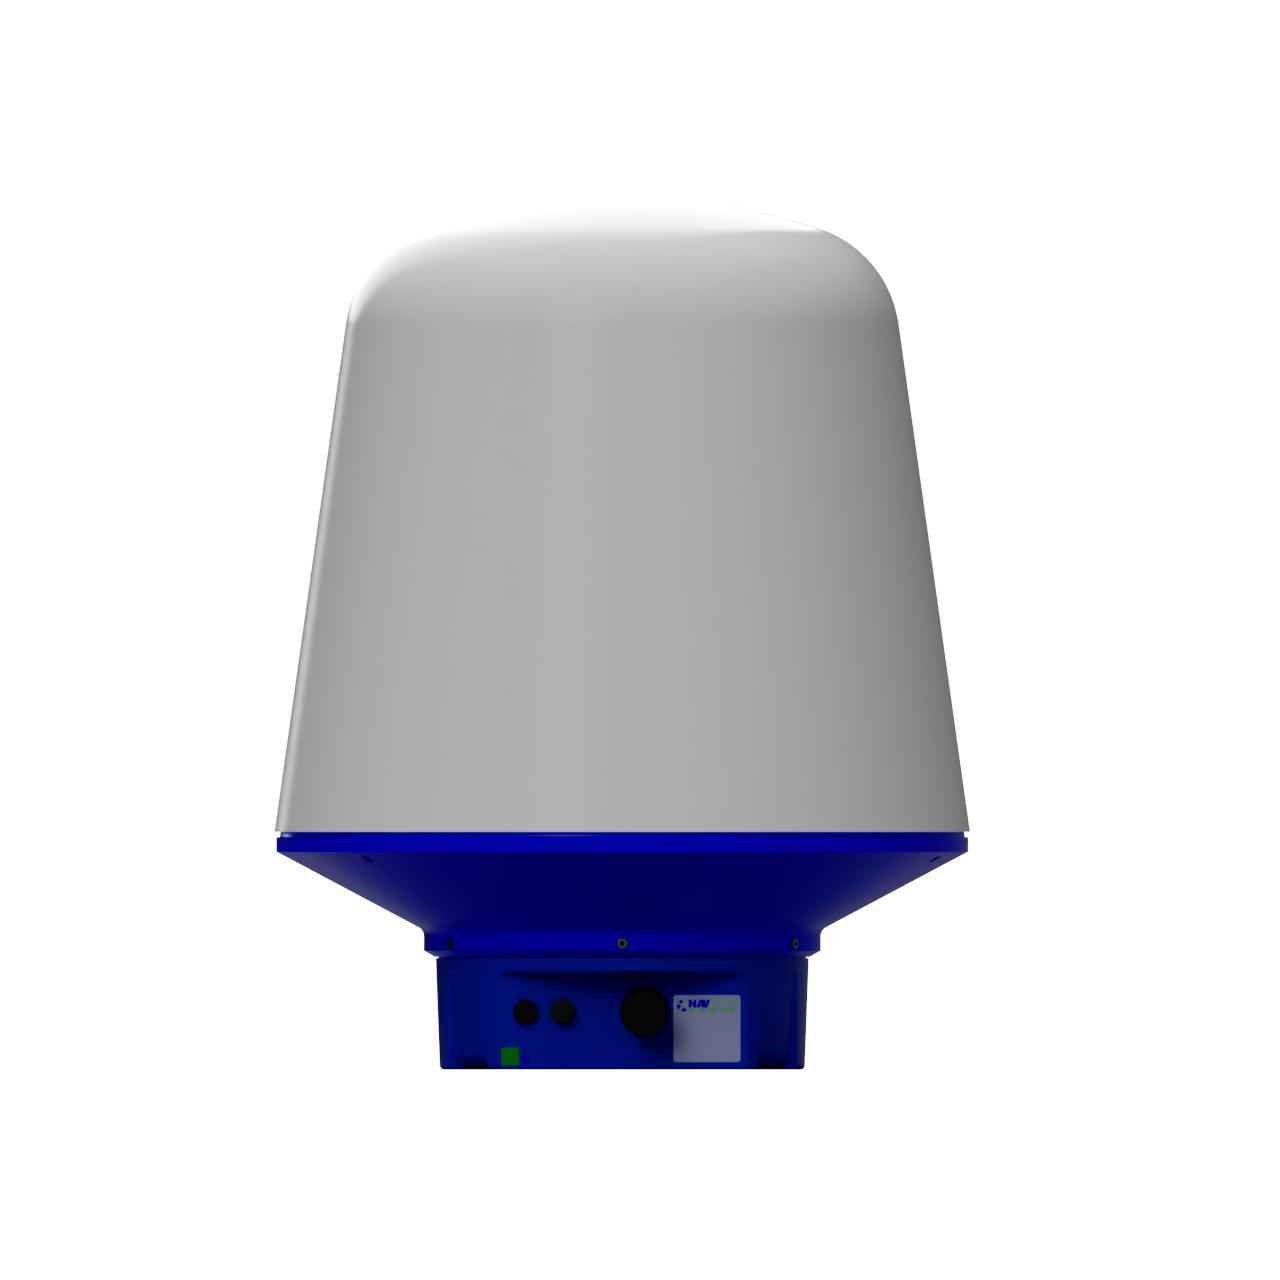 KTS350-X Radar